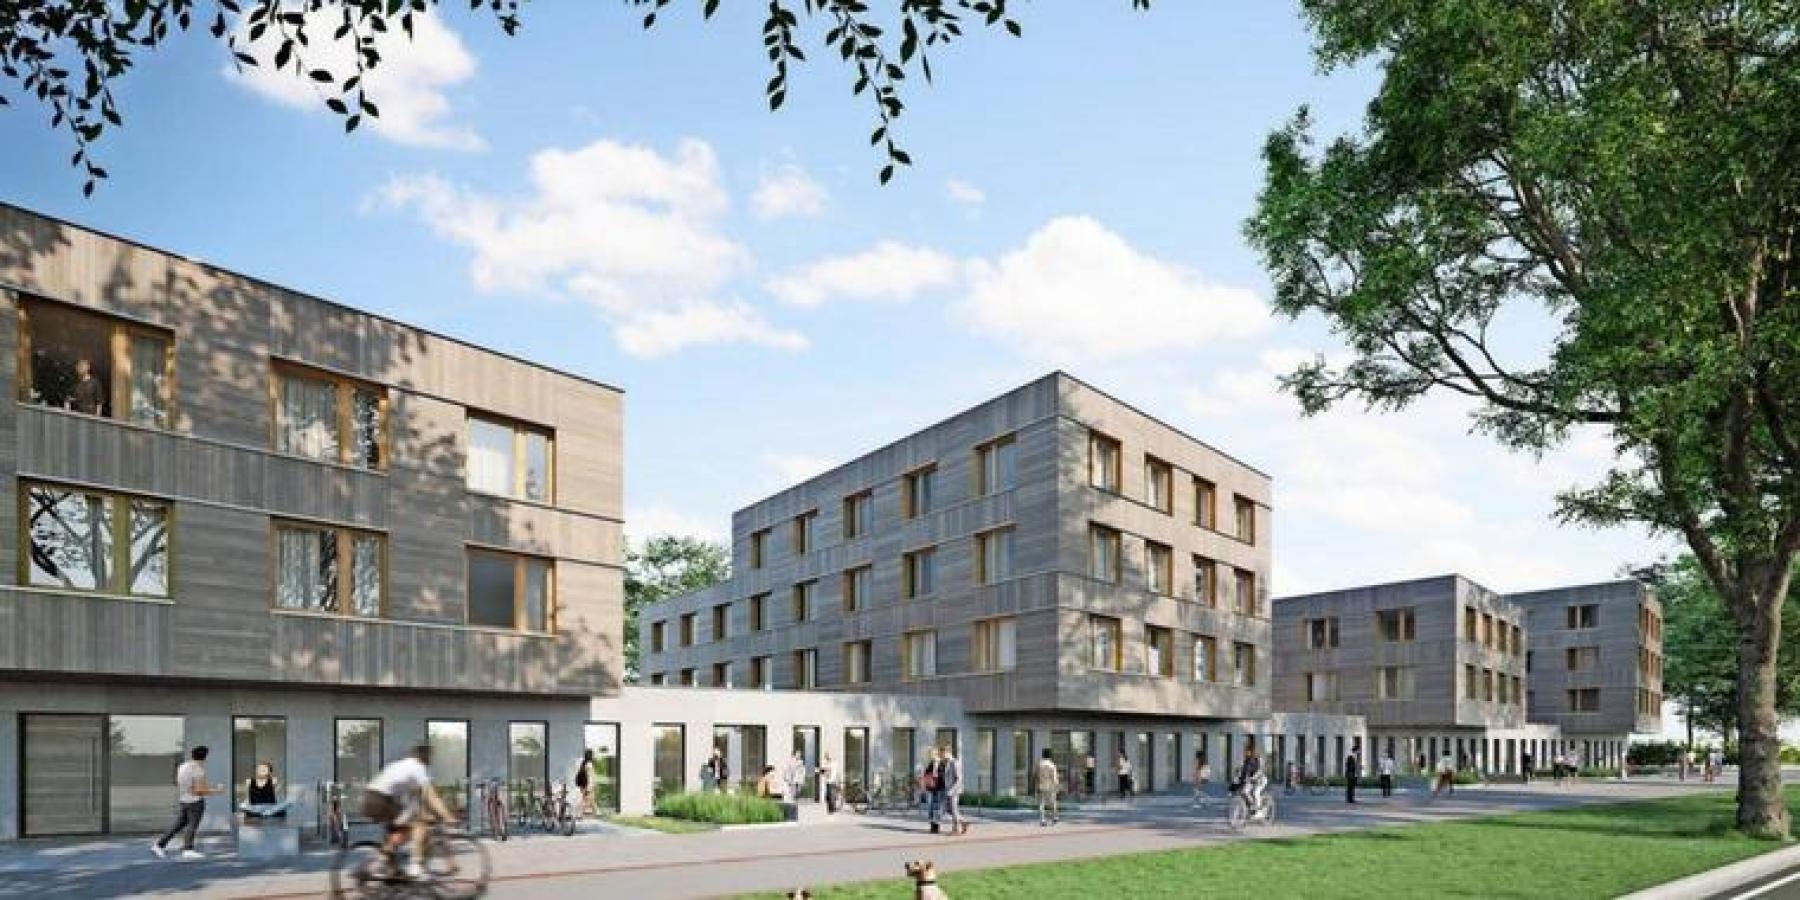 Studentisches Wohnquartier am Johann-Krane-Weg